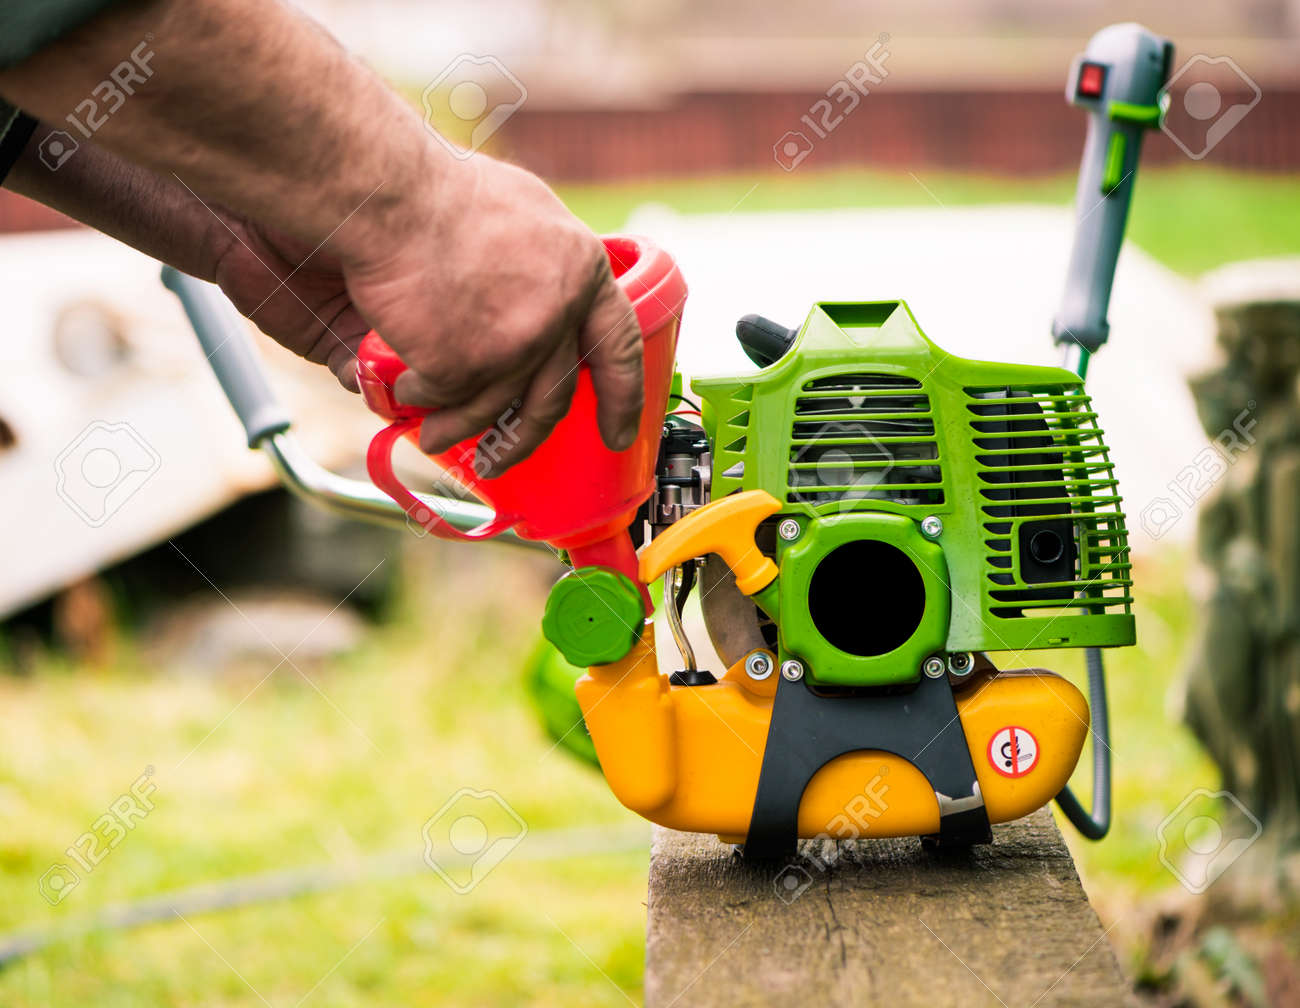 grass-cutter preparing to work on spring farmland soil - 169122092